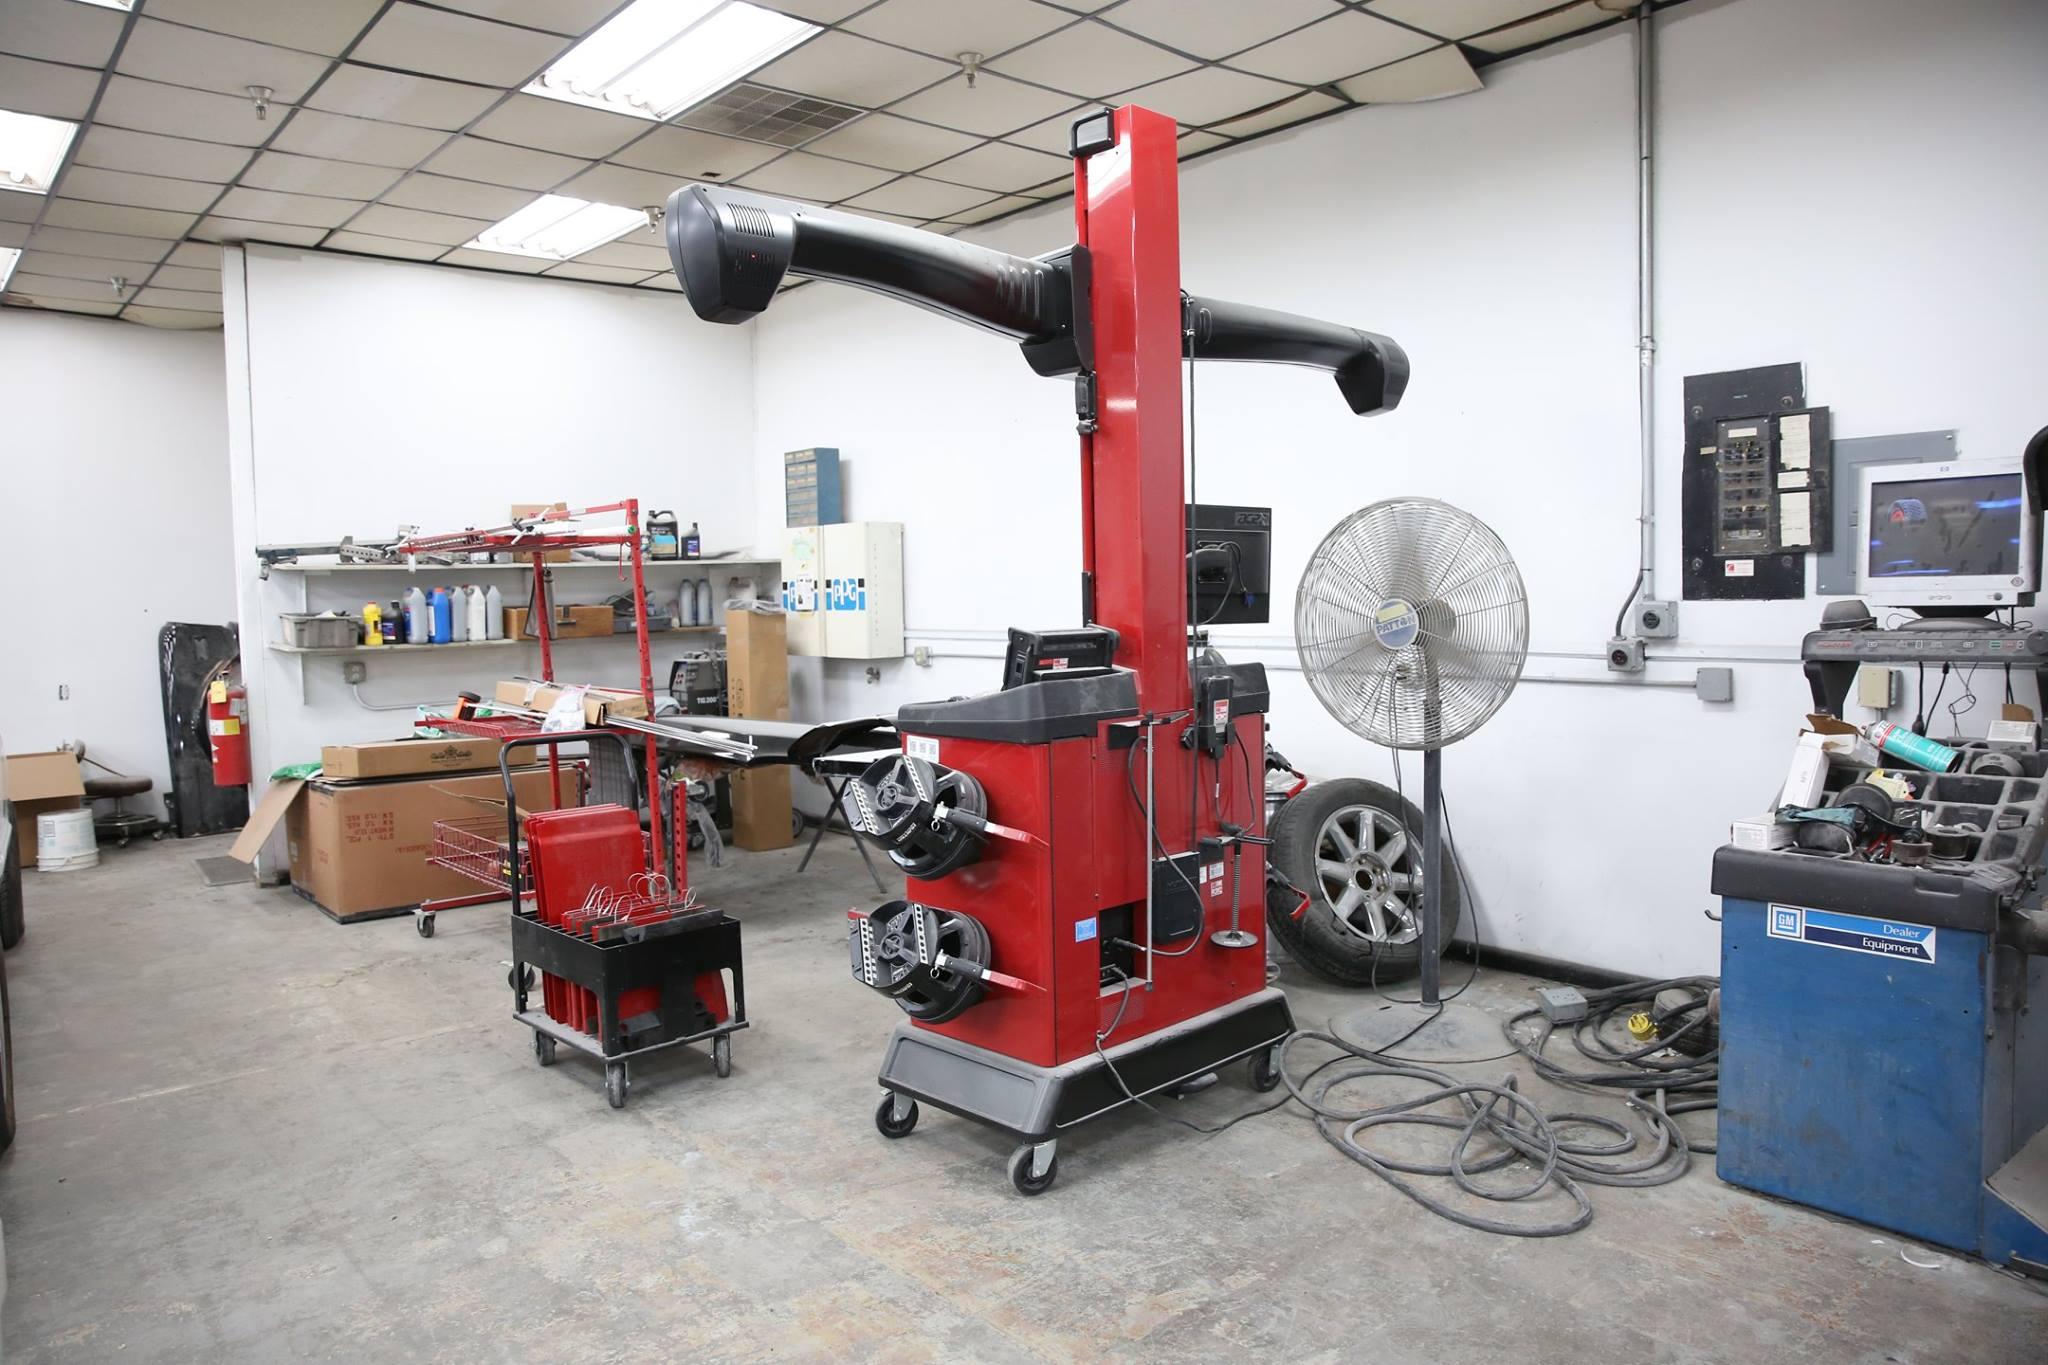 Auto Body Repair Shop in Lexington, KY | Collision Center at